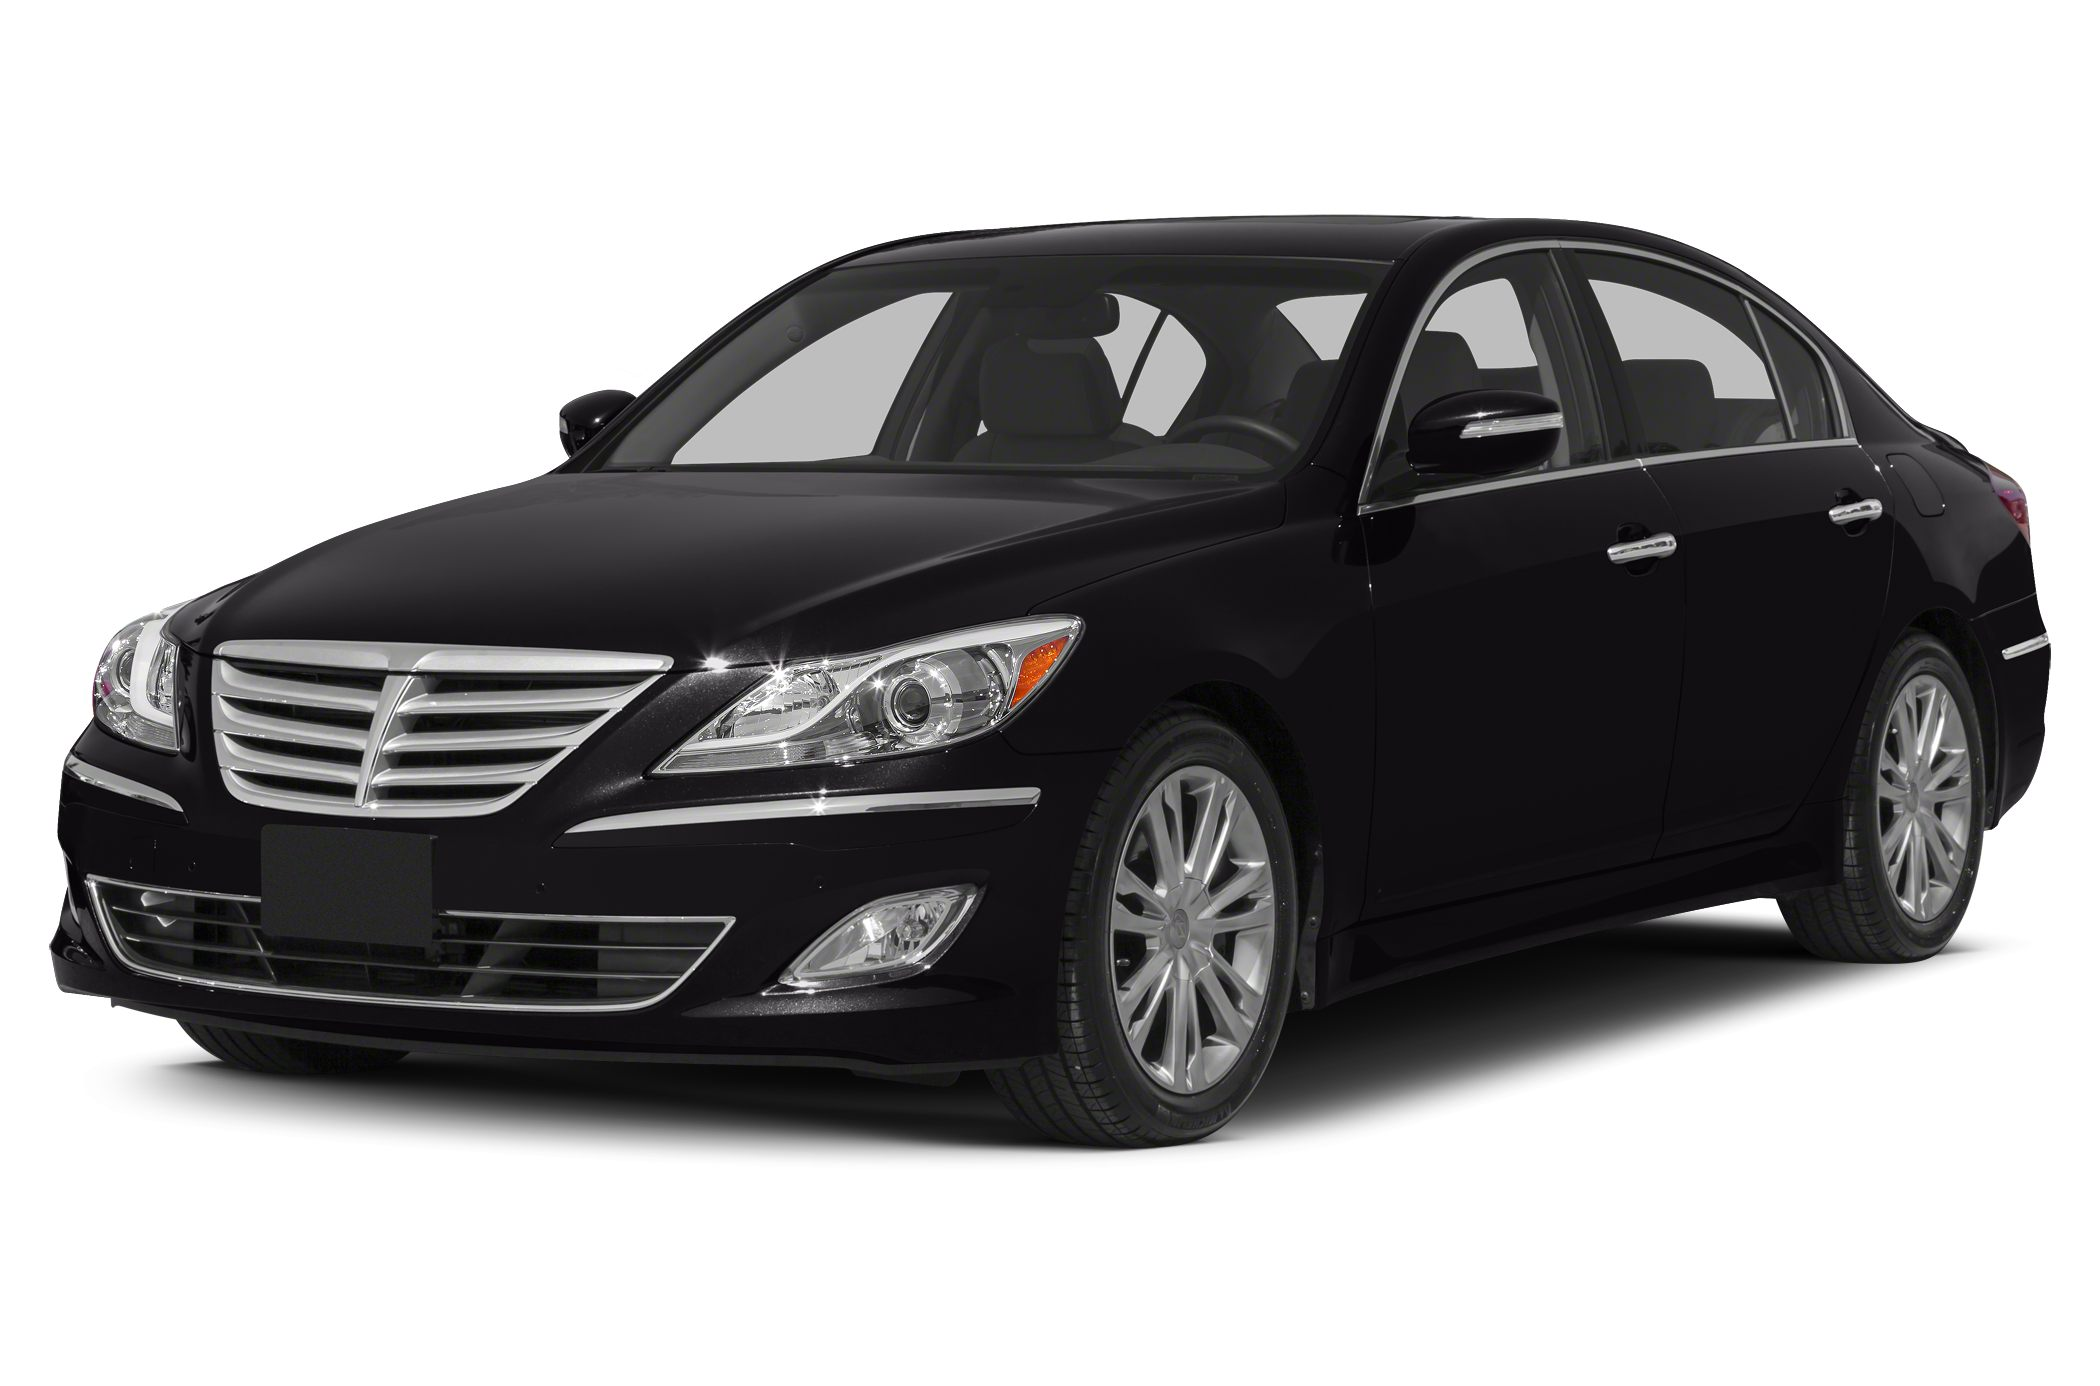 2014 Hyundai Genesis 3.8 Sedan for sale in Scottsdale for $29,999 with 9,699 miles.